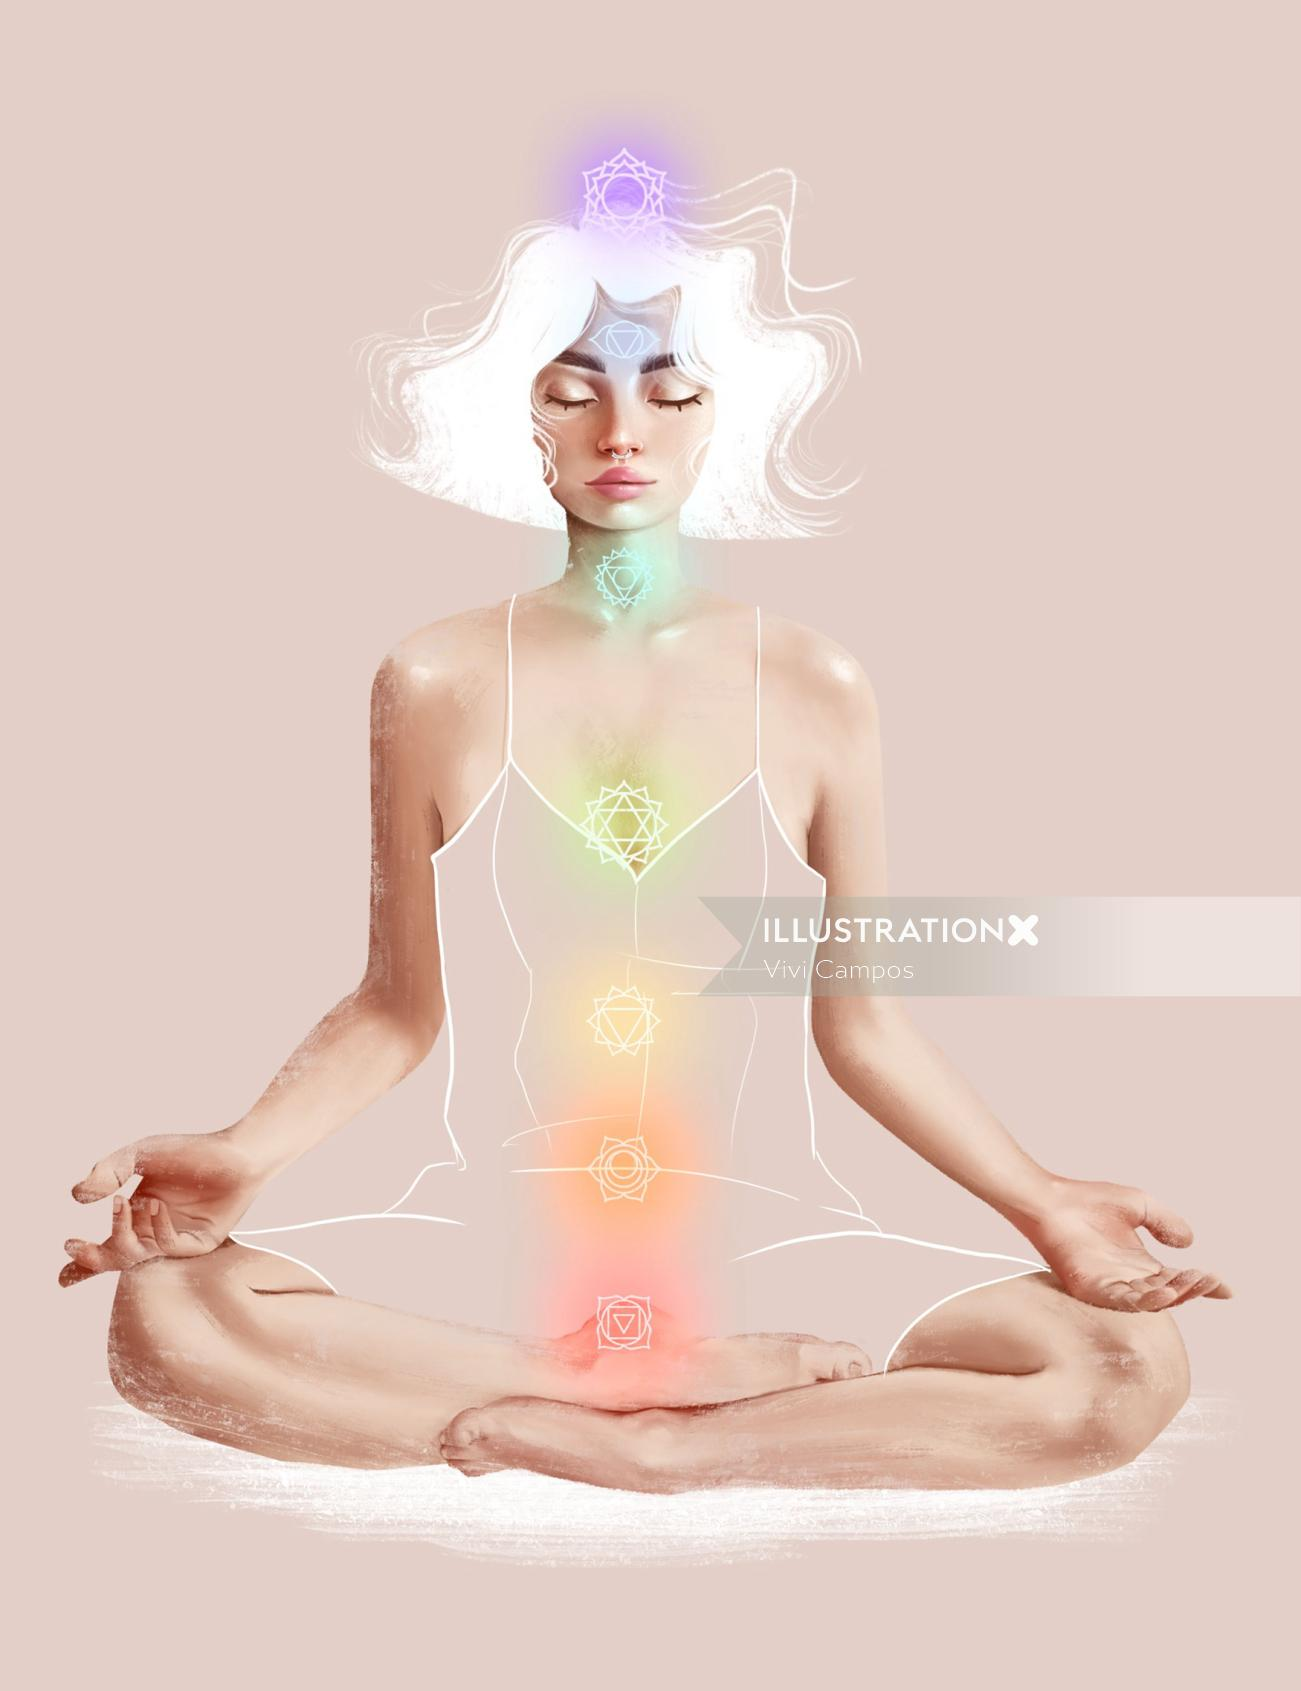 Character design of woman meditation